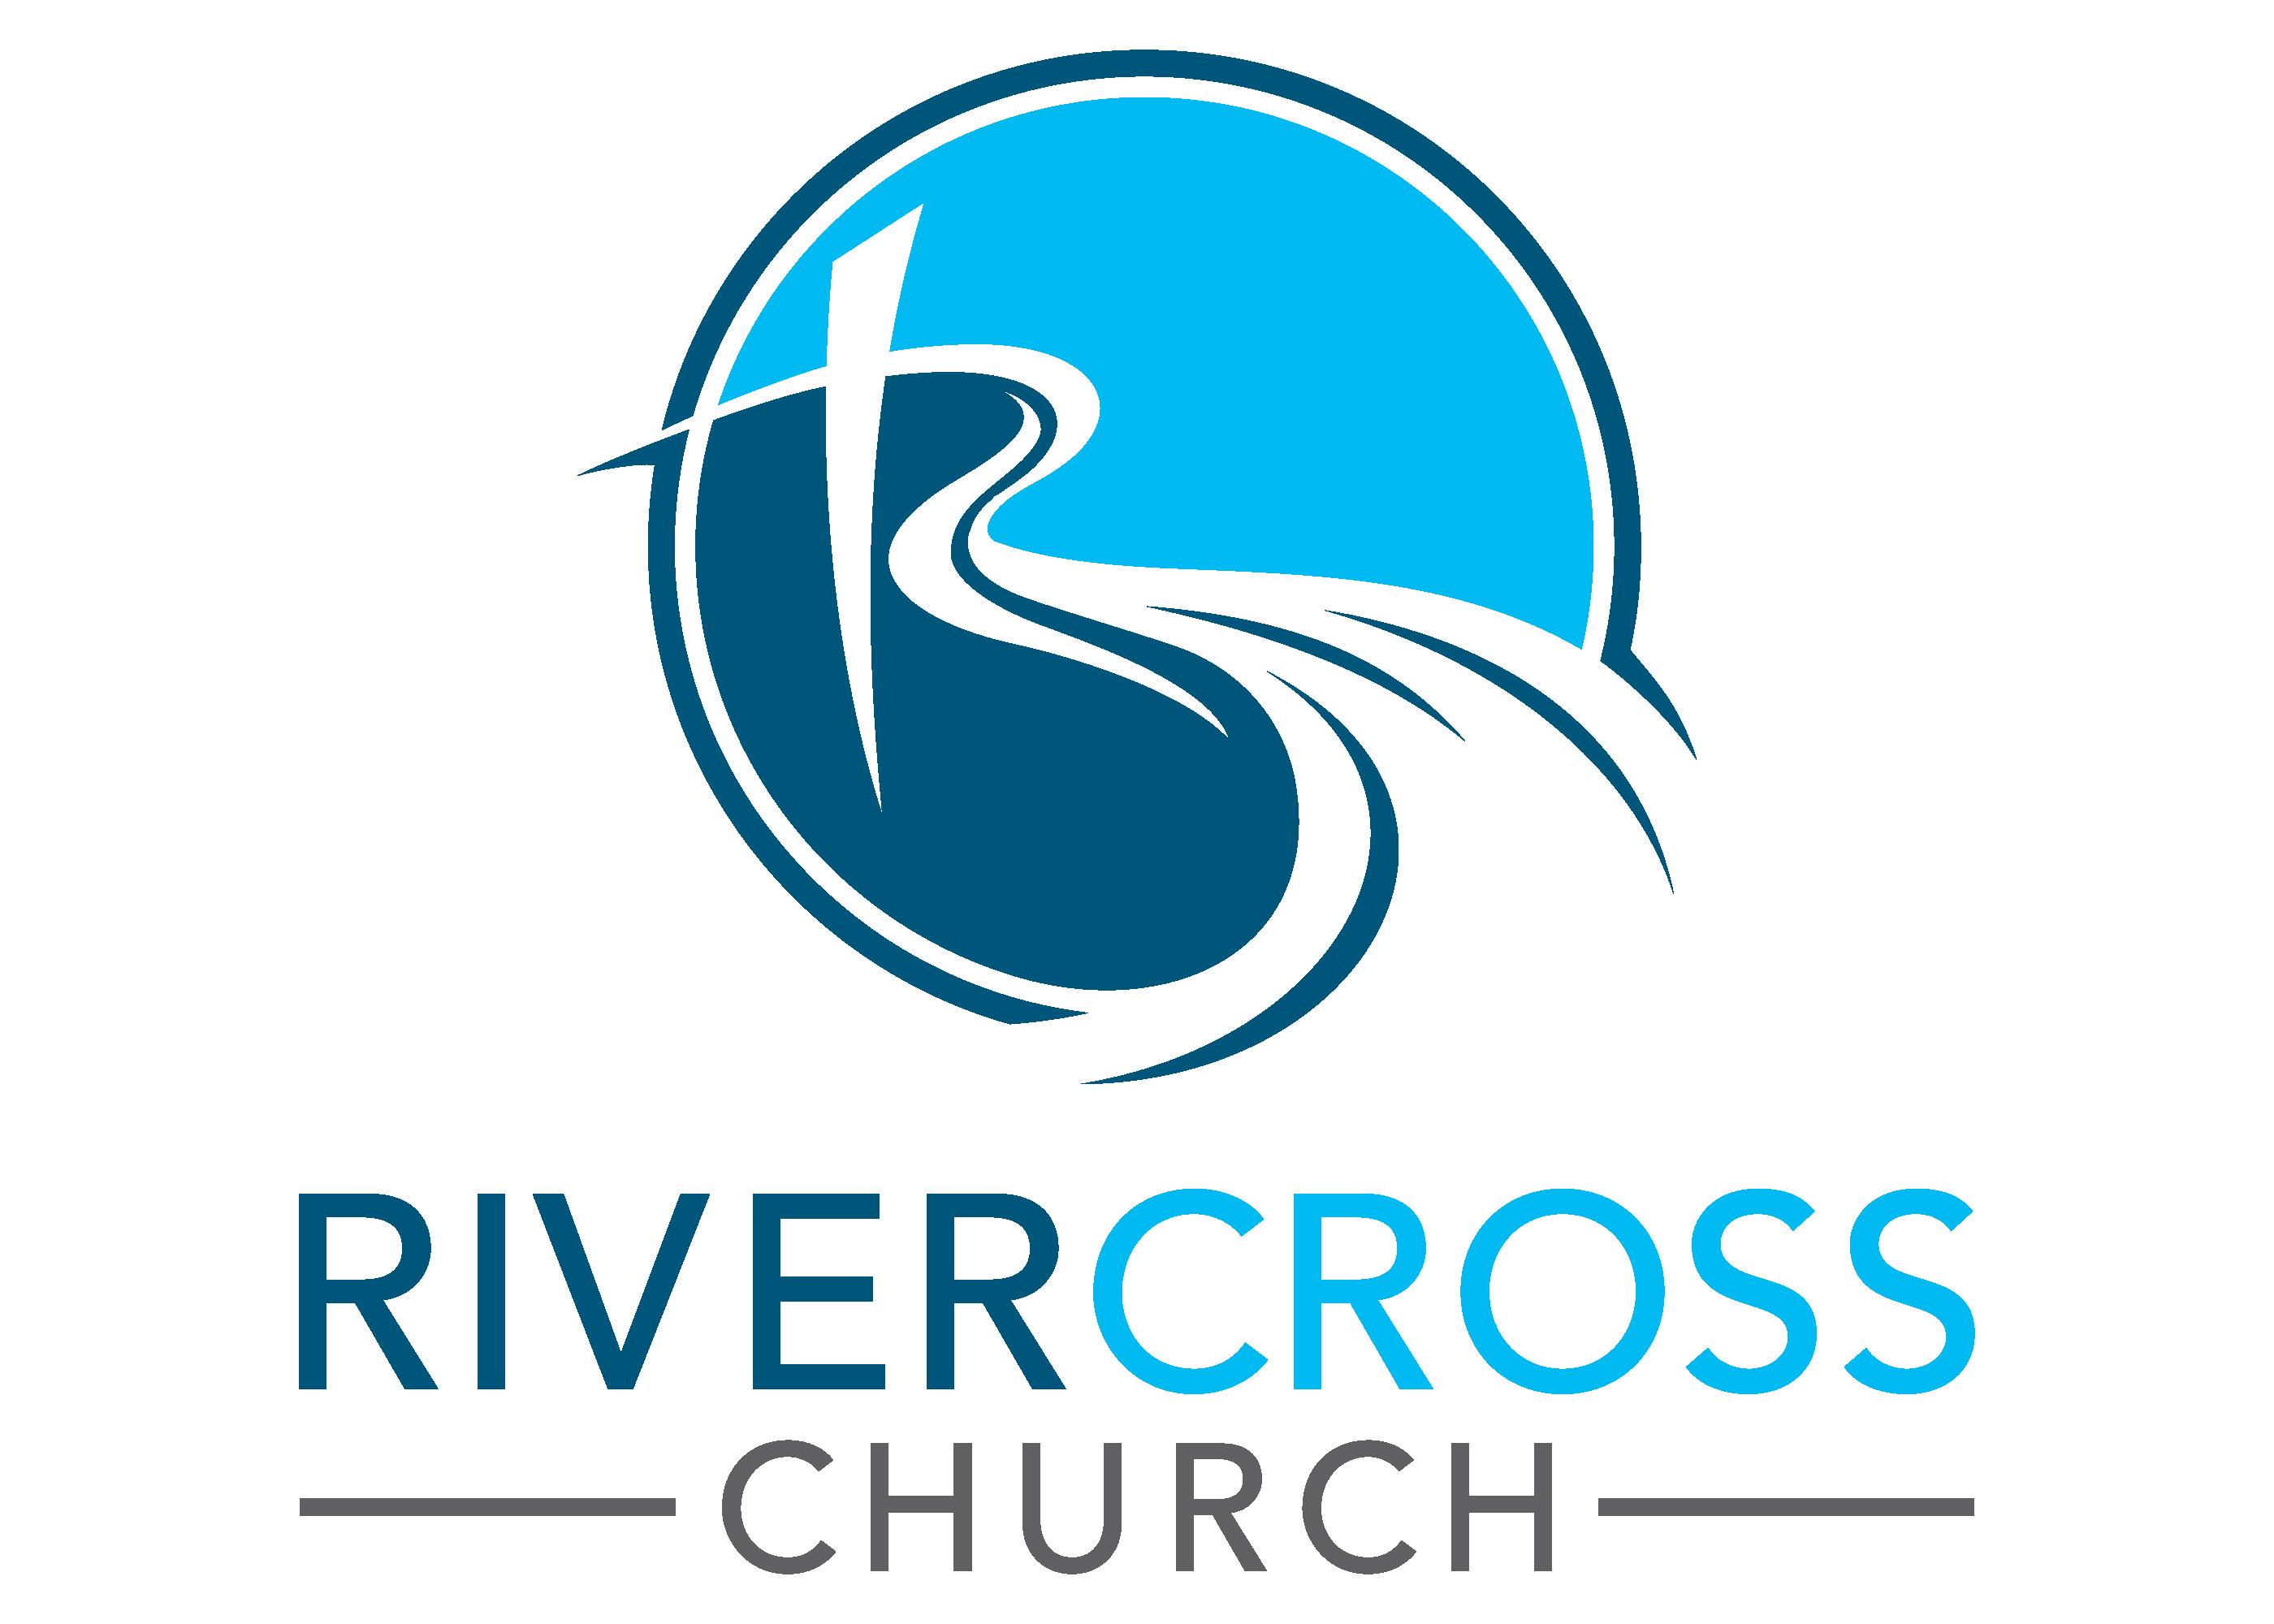 Help a new church serve our community: RiverCross Church